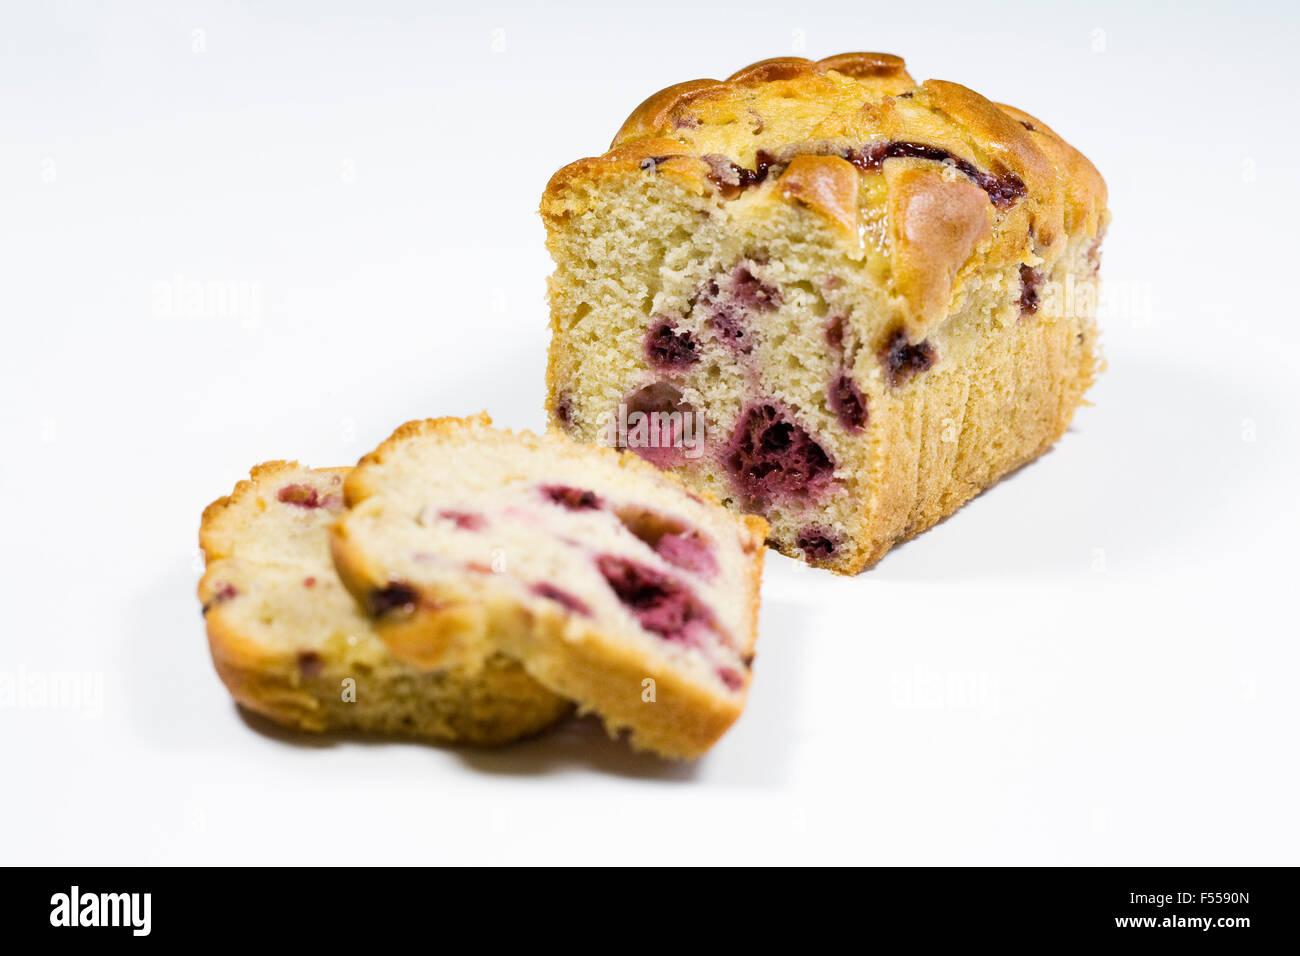 Homemade raspberry and lemon loaf cake. - Stock Image